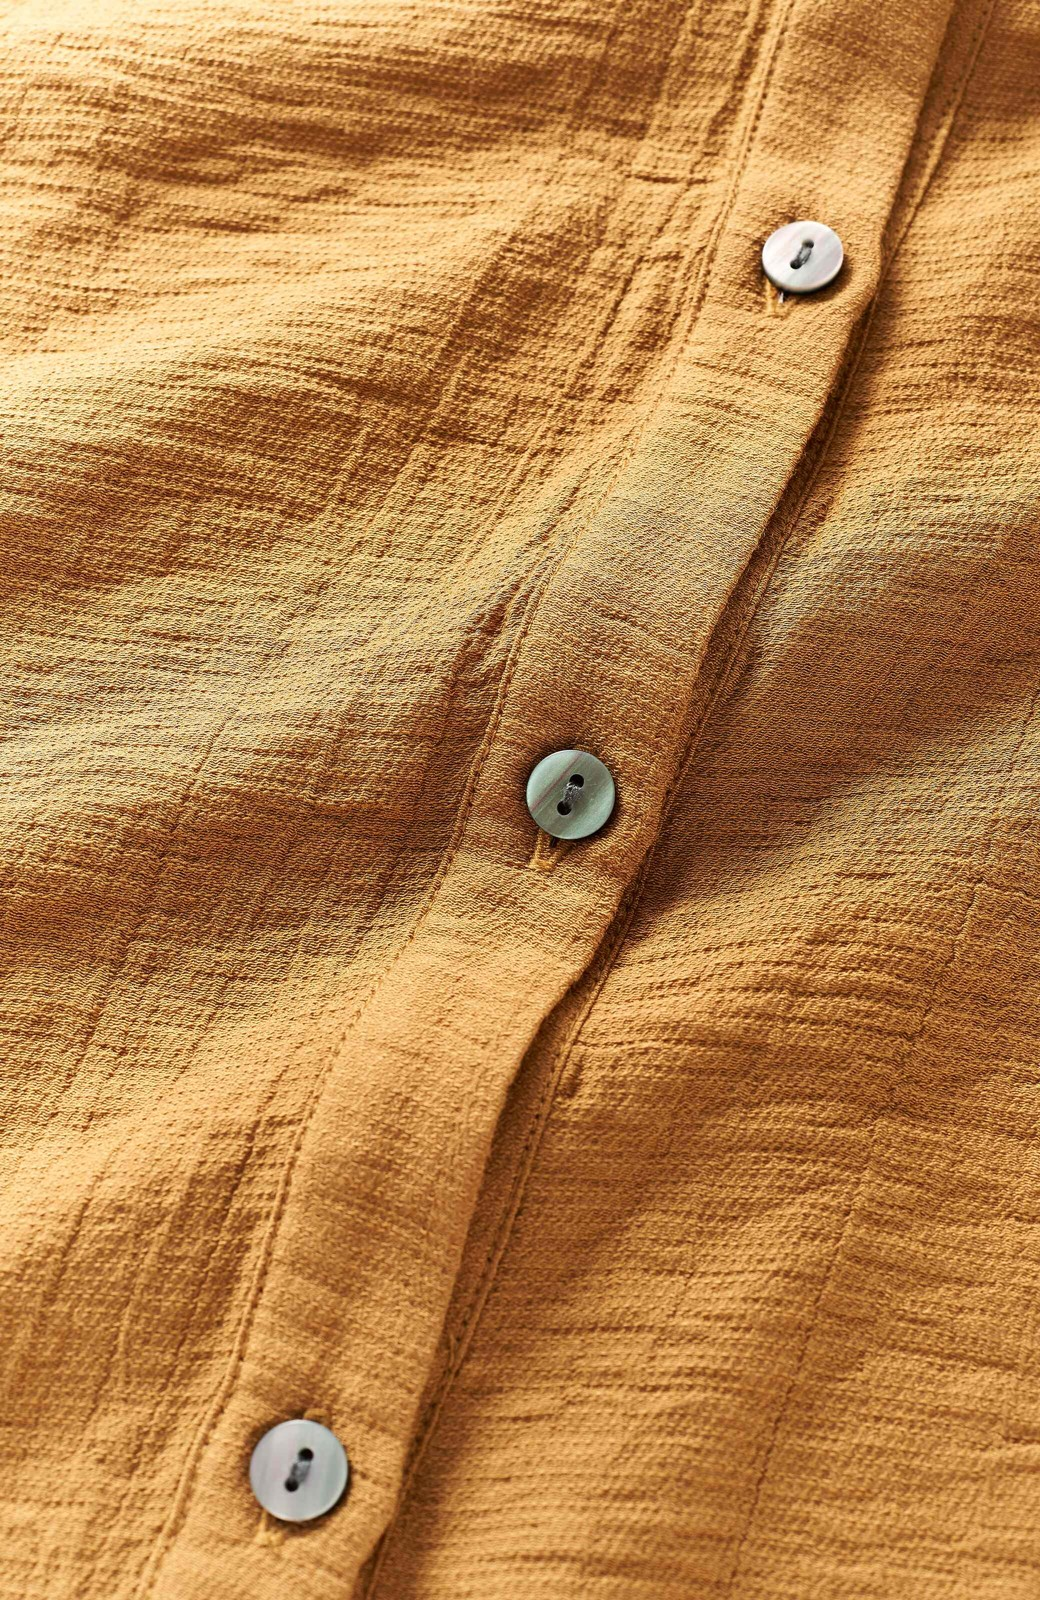 haco! 太ってもばれず 羽織っても便利なウエストリボンワンピース <マスタード>の商品写真3